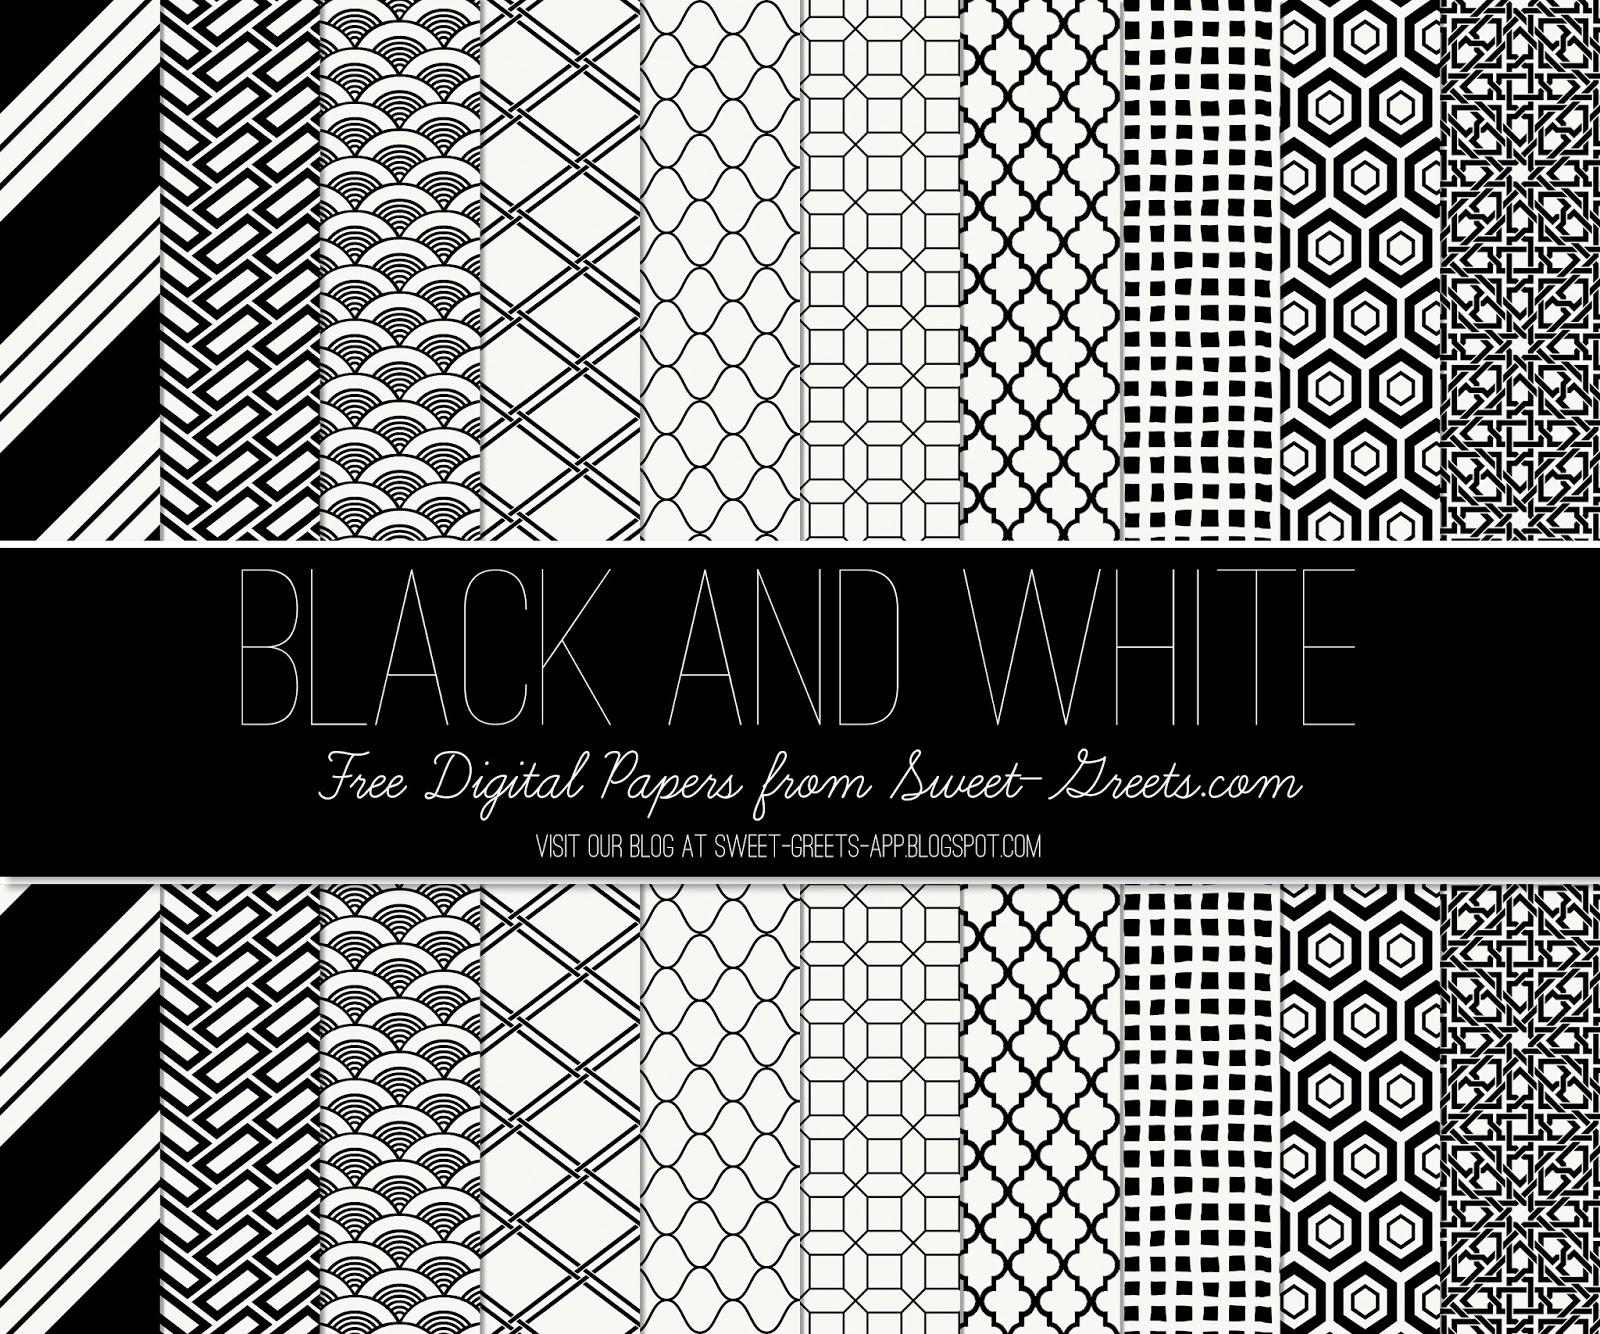 Free Black and White Digital Paper